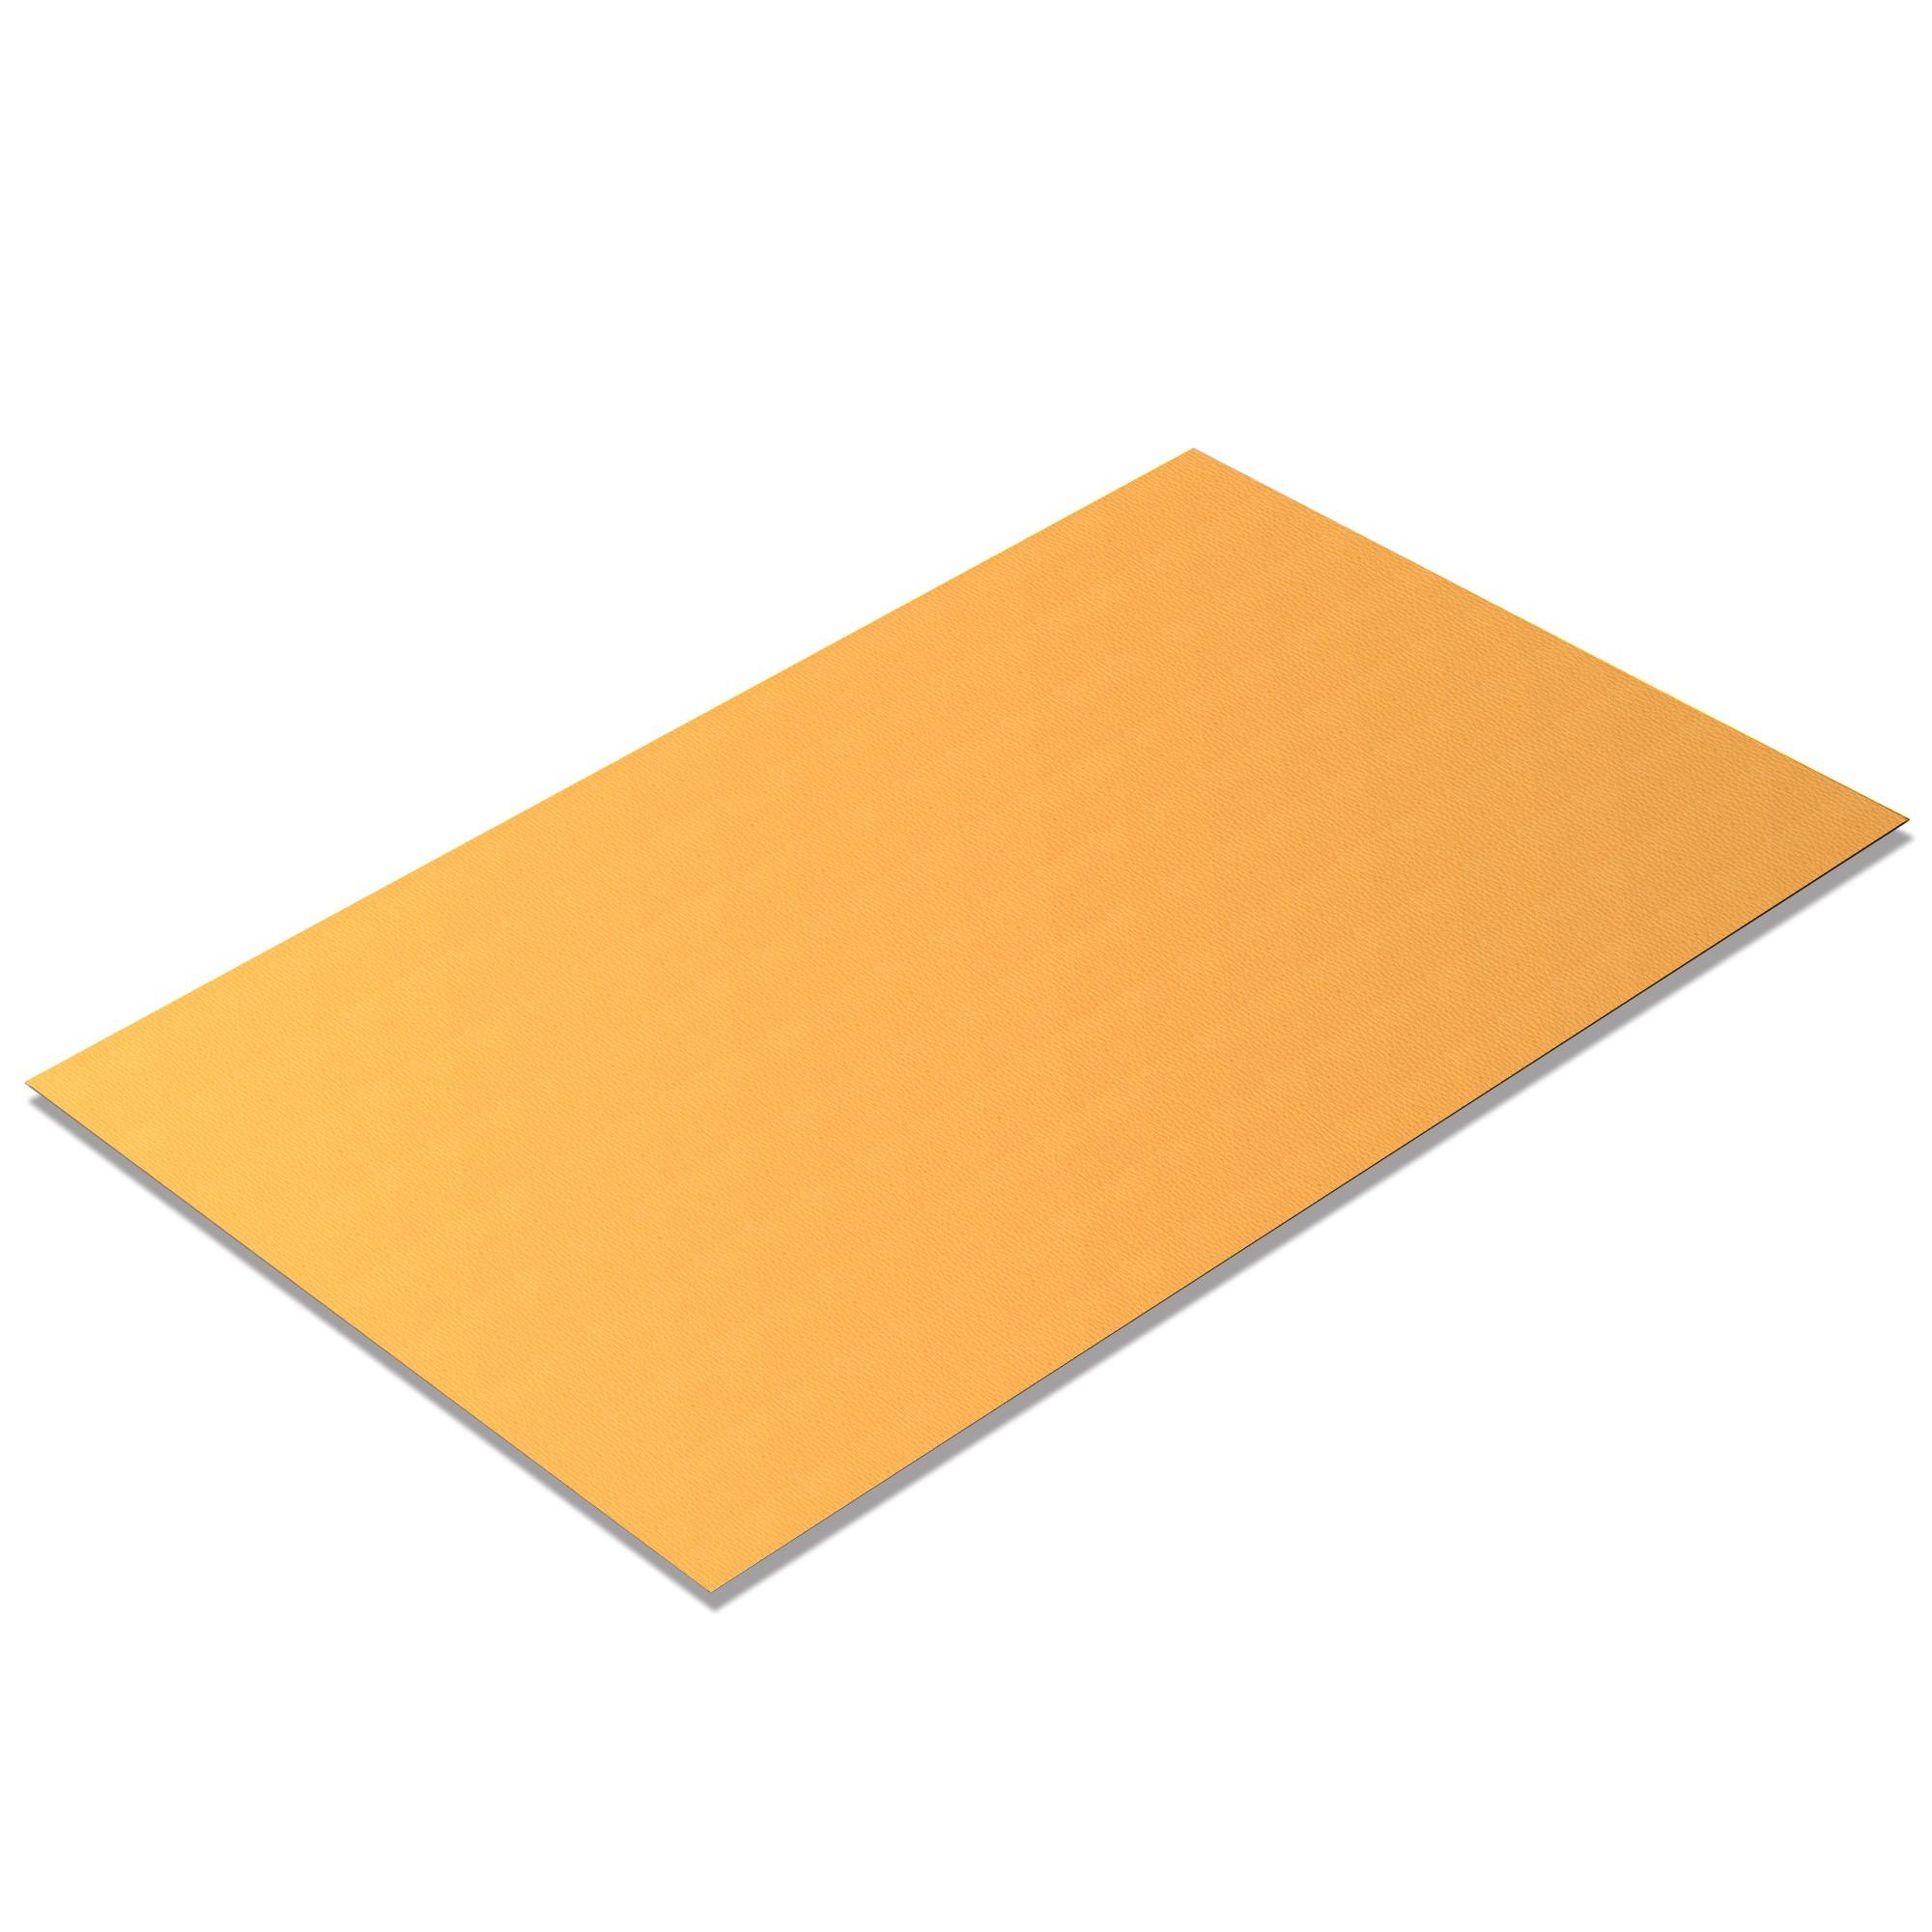 Kunstleder Meterware Nevada Orange [NEV020]